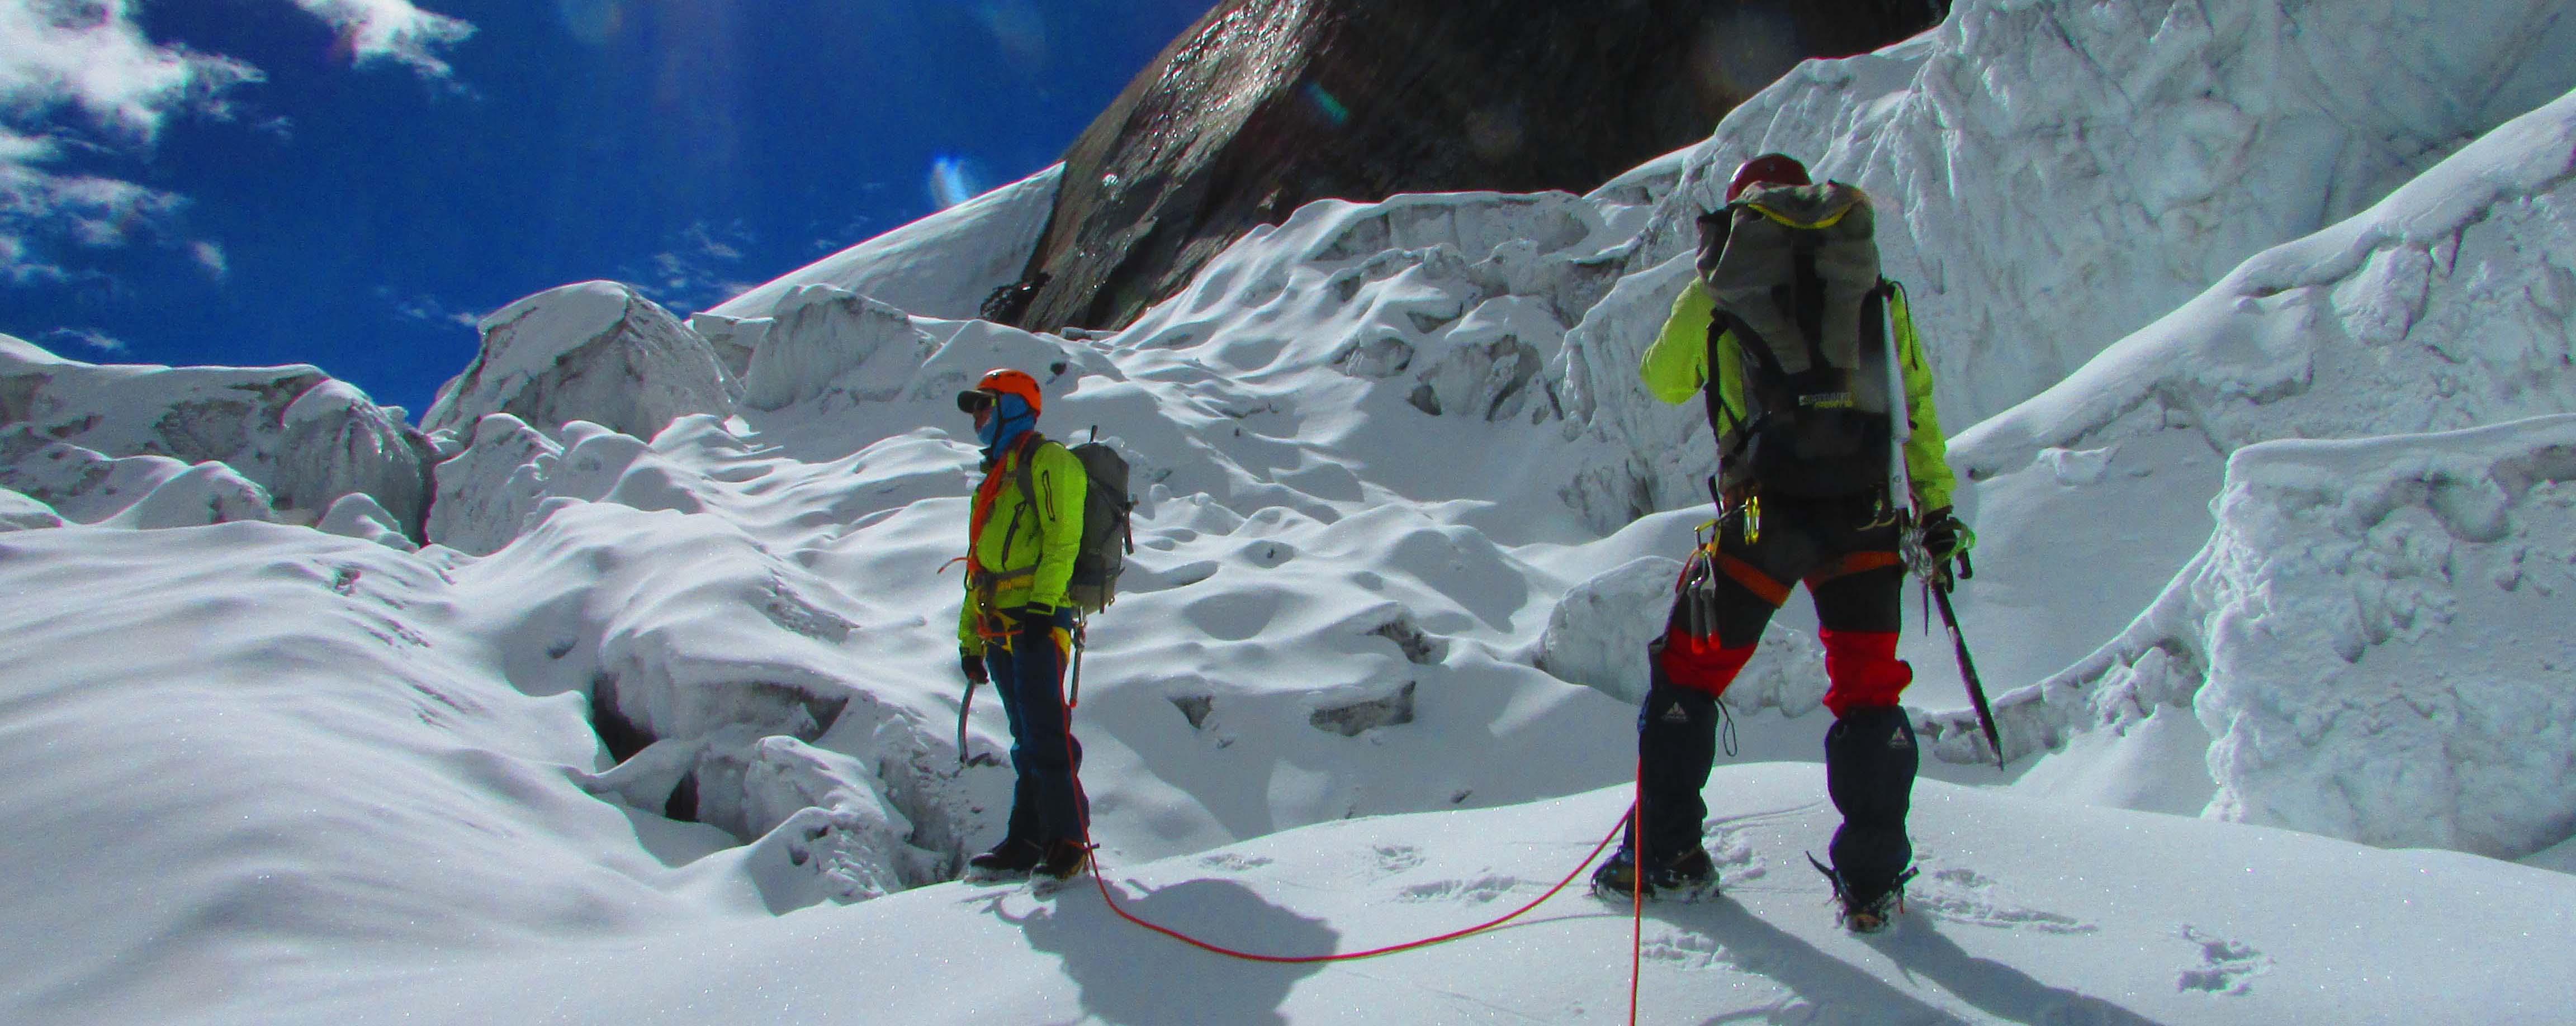 tobsar-peak-climbing.jpg